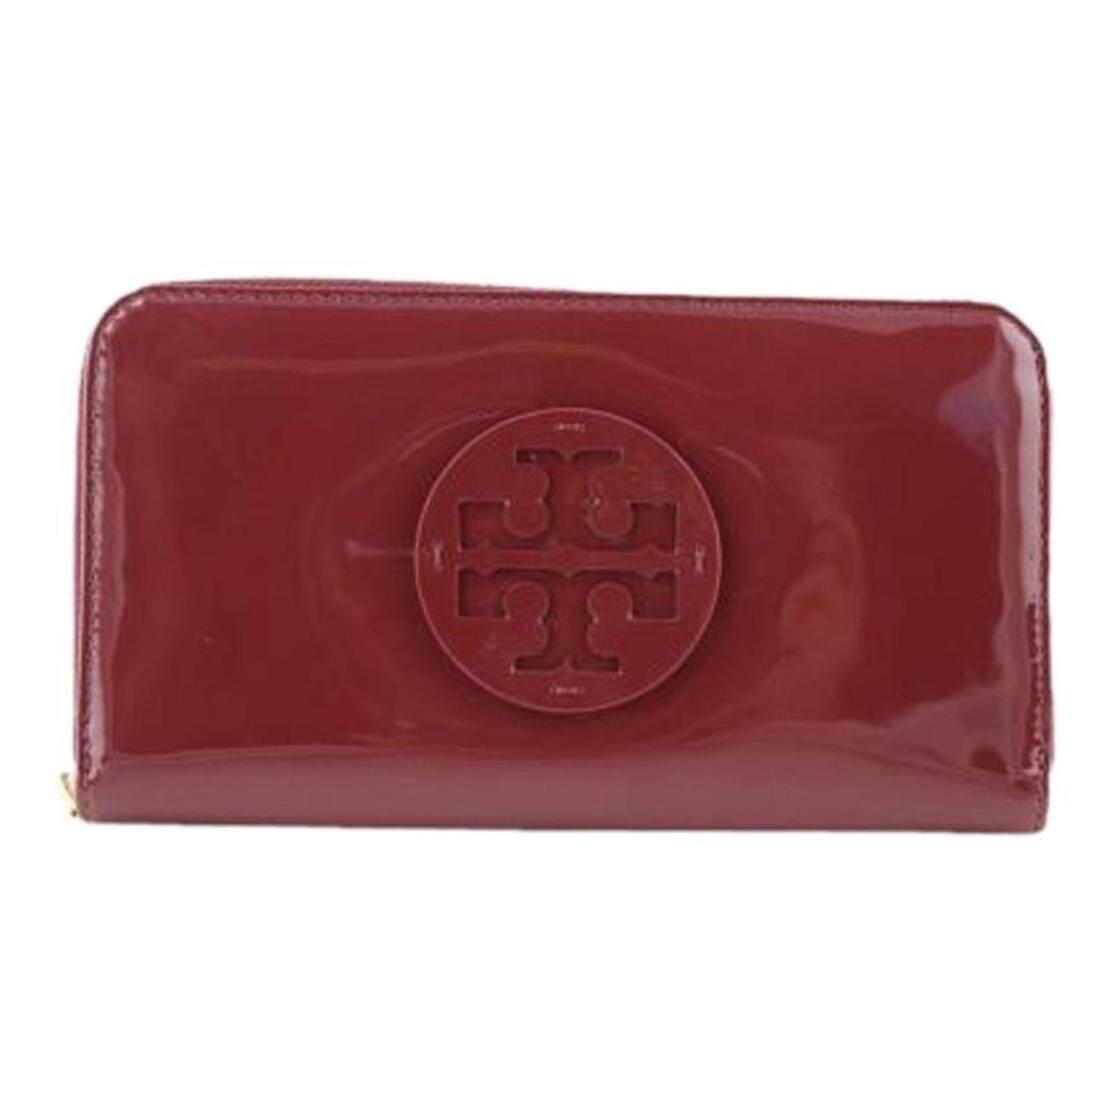 b90add3c7c0 Tory Burch Patent Leather Continental Wallet (equestrian orange)